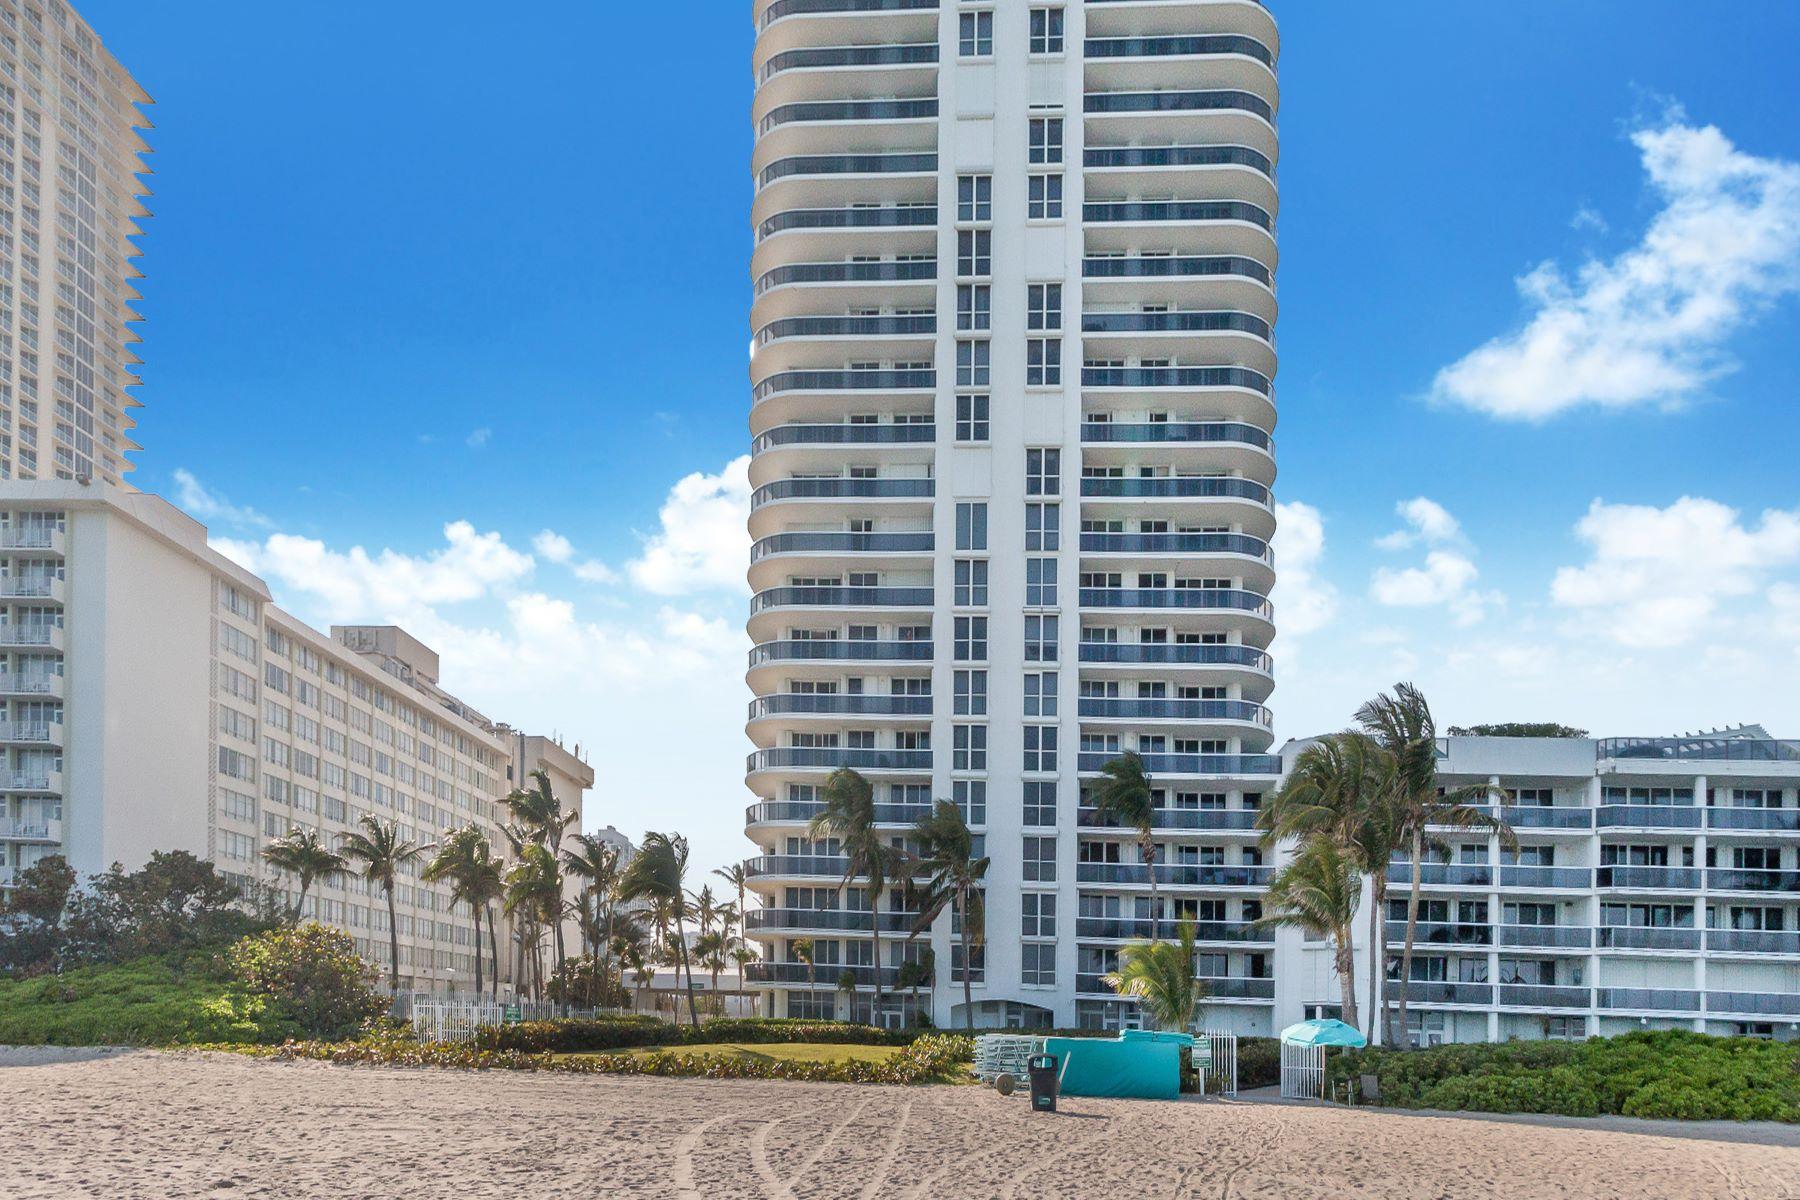 شقة بعمارة للـ Rent في 16711 Collins Ave #TS 04 16711 Collins Ave TS 04, Sunny Isles Beach, Florida, 33160 United States